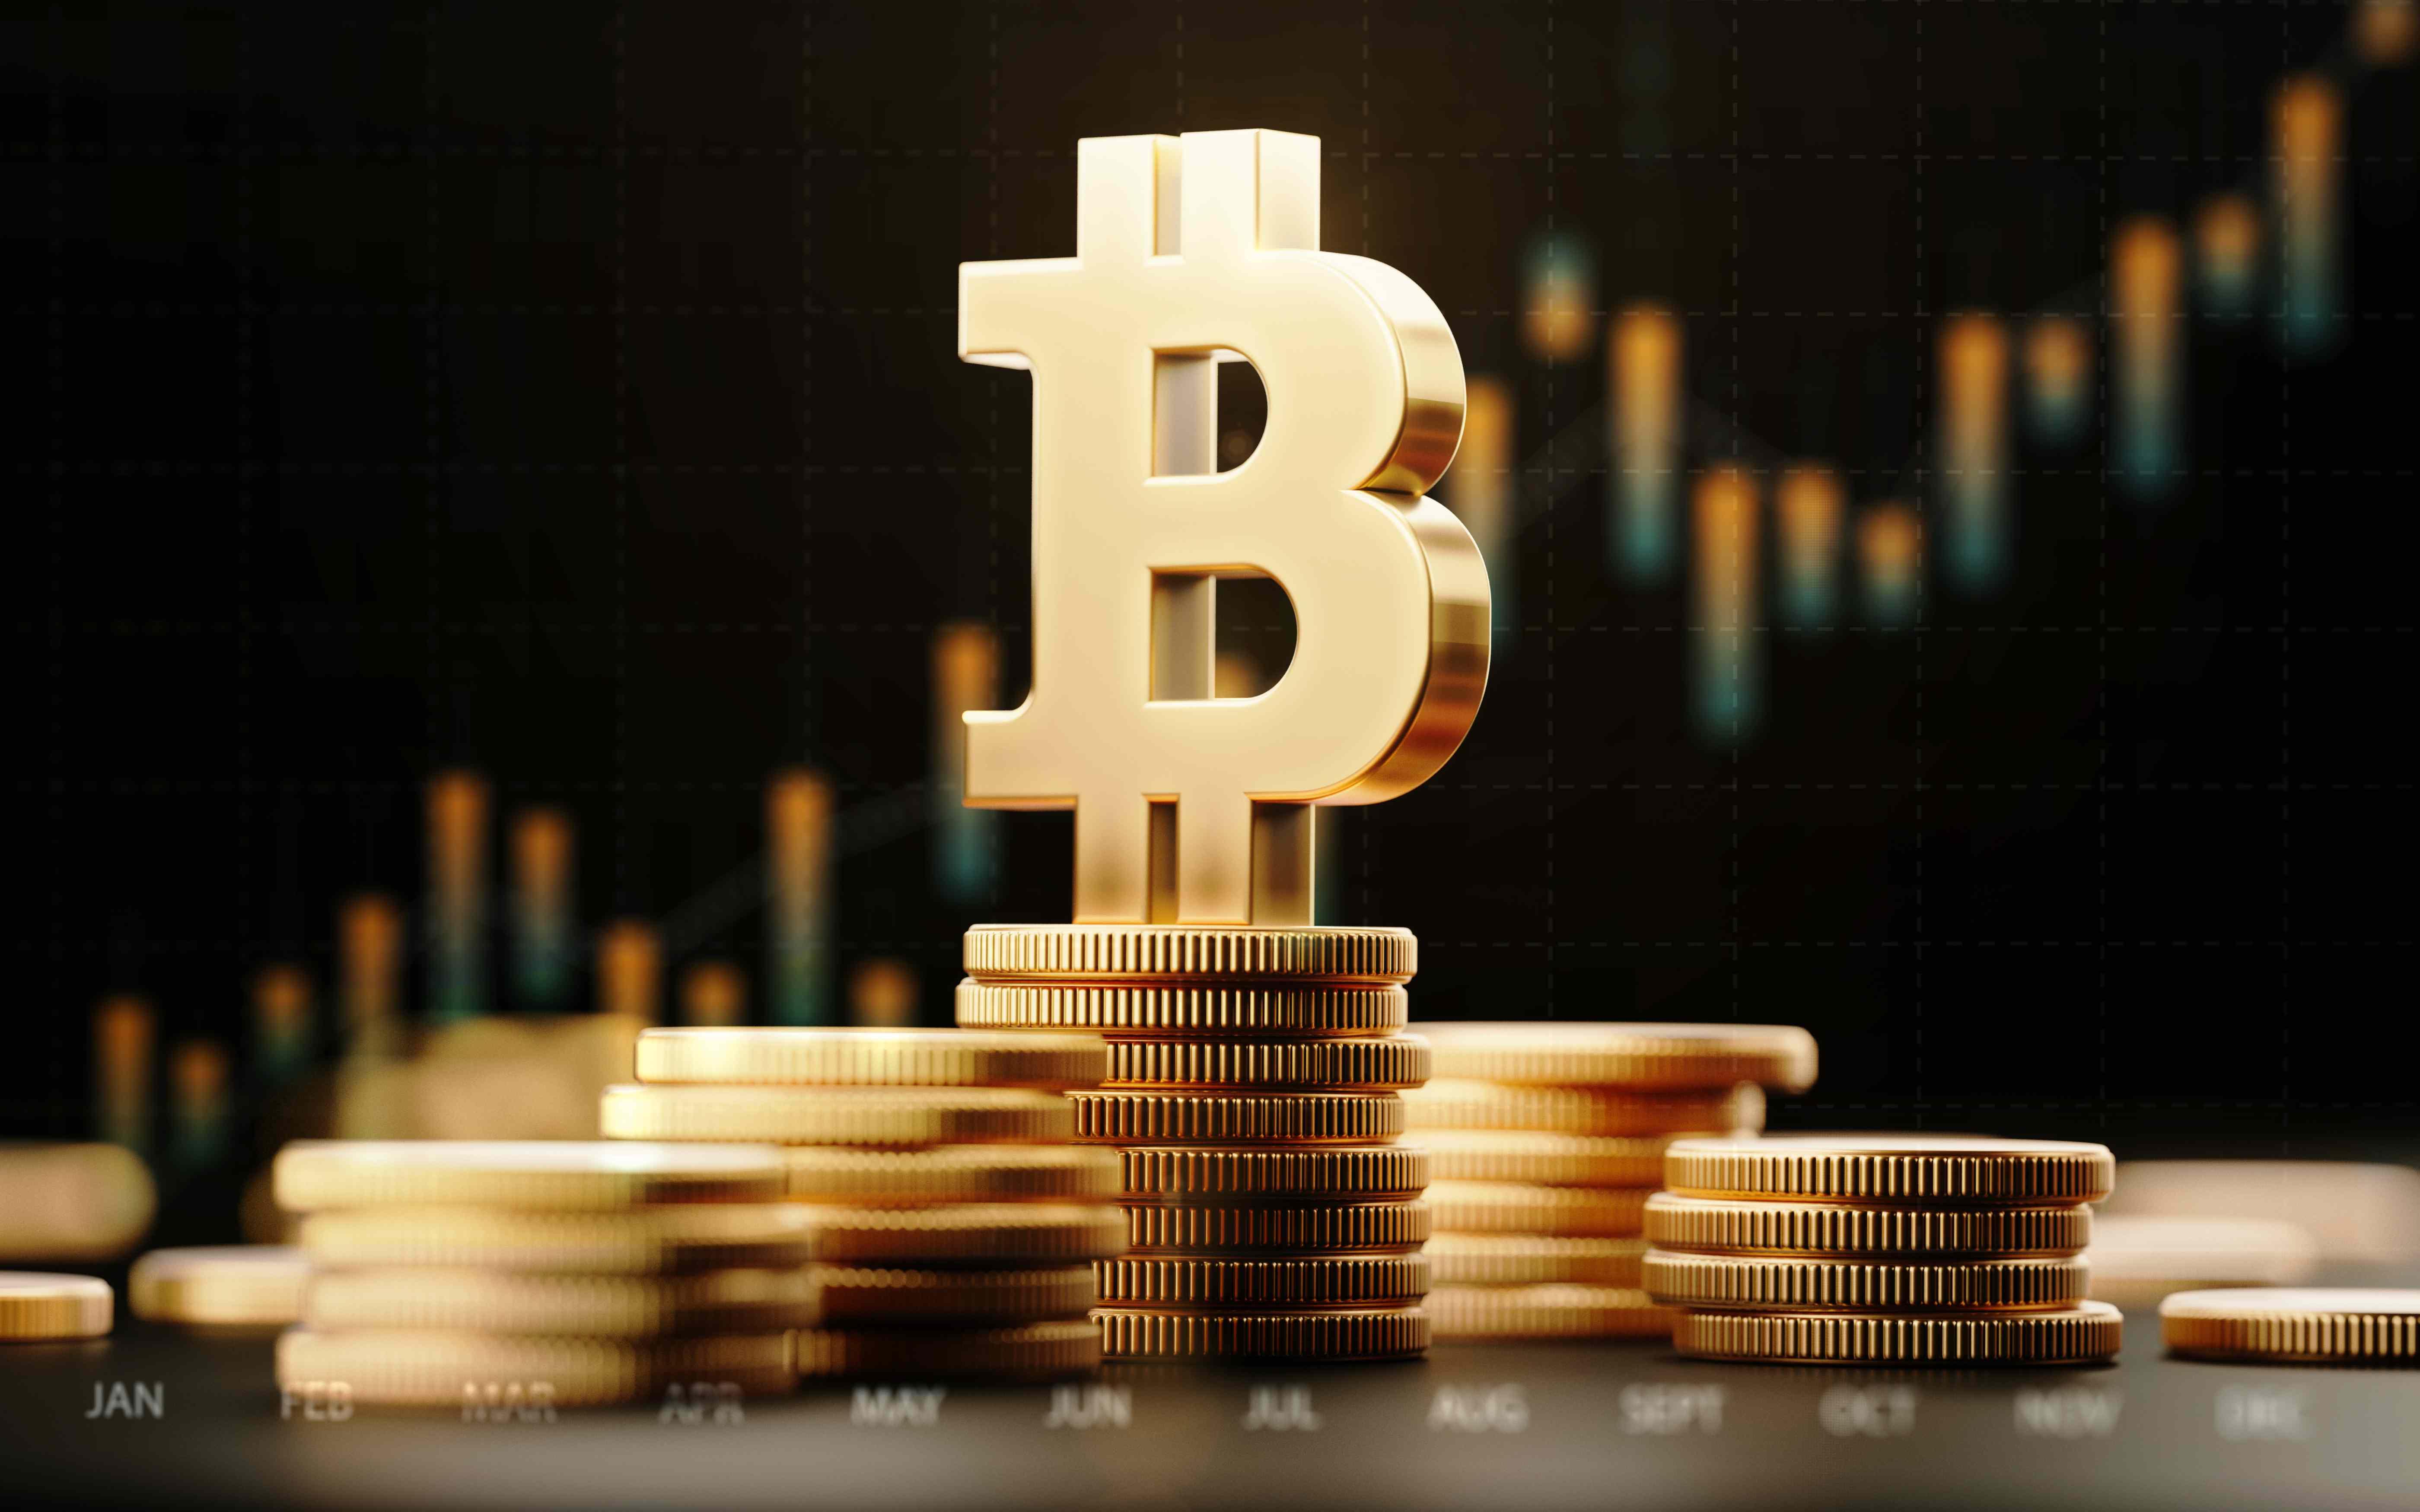 Gold bitcoin logo on stack of gold Bitcoin tokens